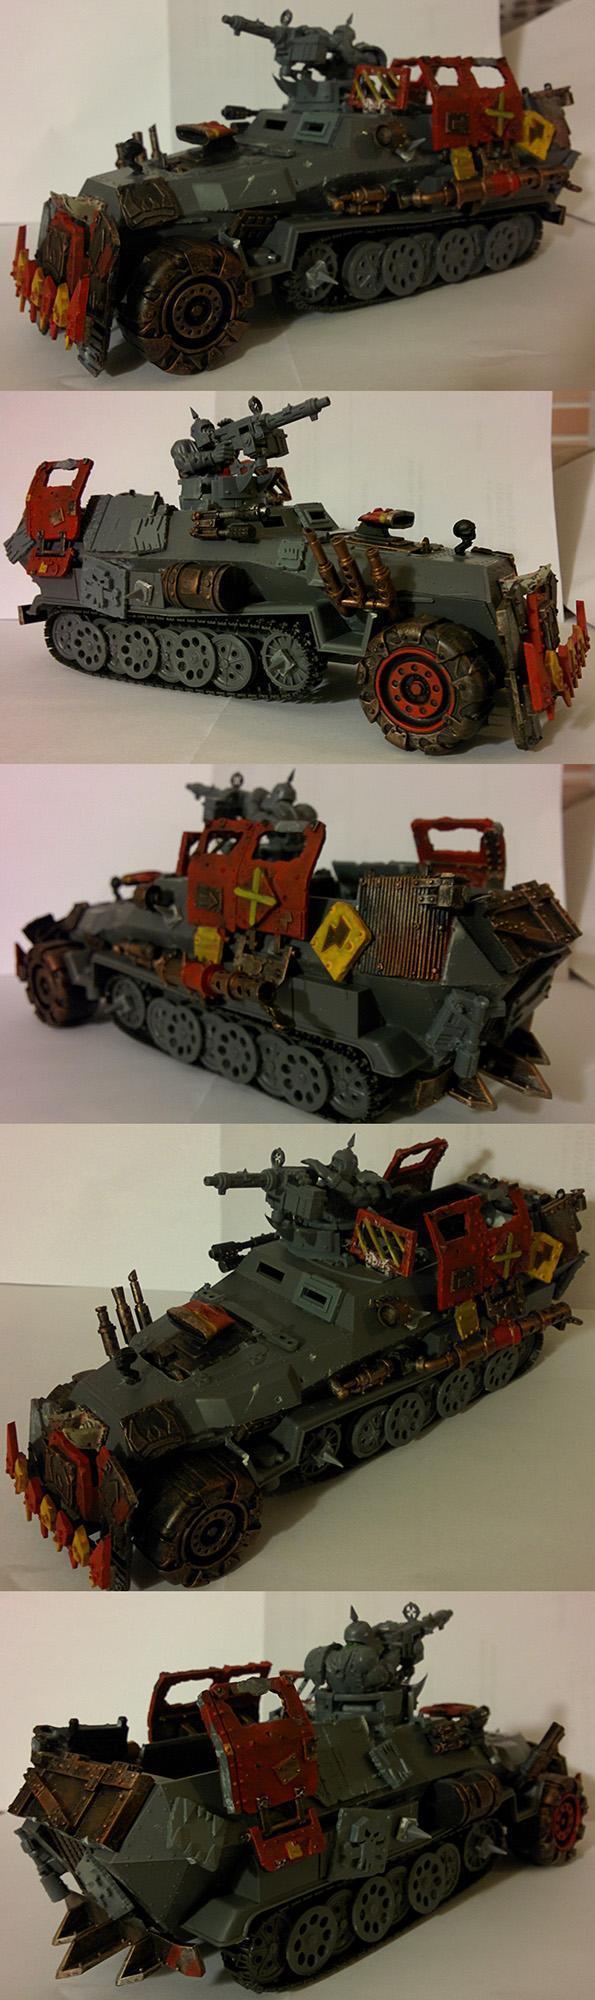 Armored Car, Germans, Nazi, Orks, Trukk